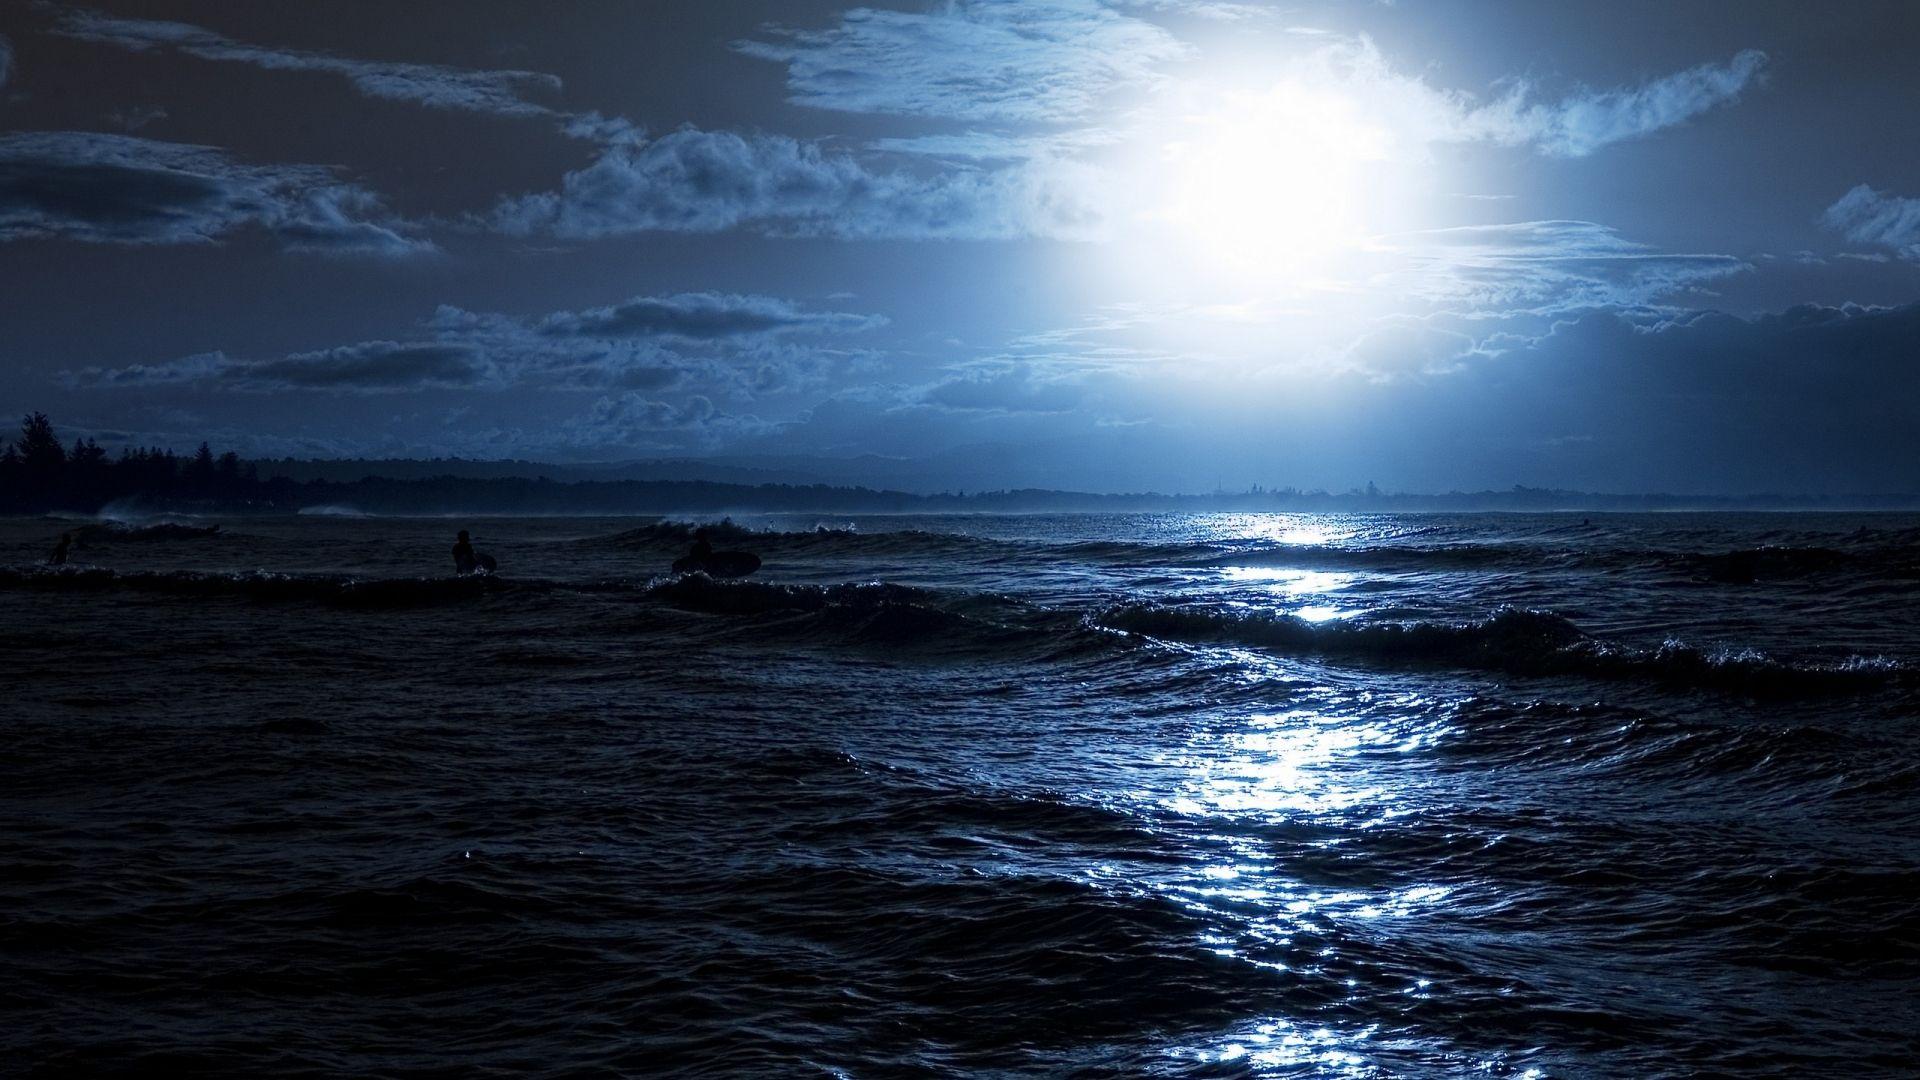 Moonlight With Images Ocean At Night Ocean Wallpaper Night Sea